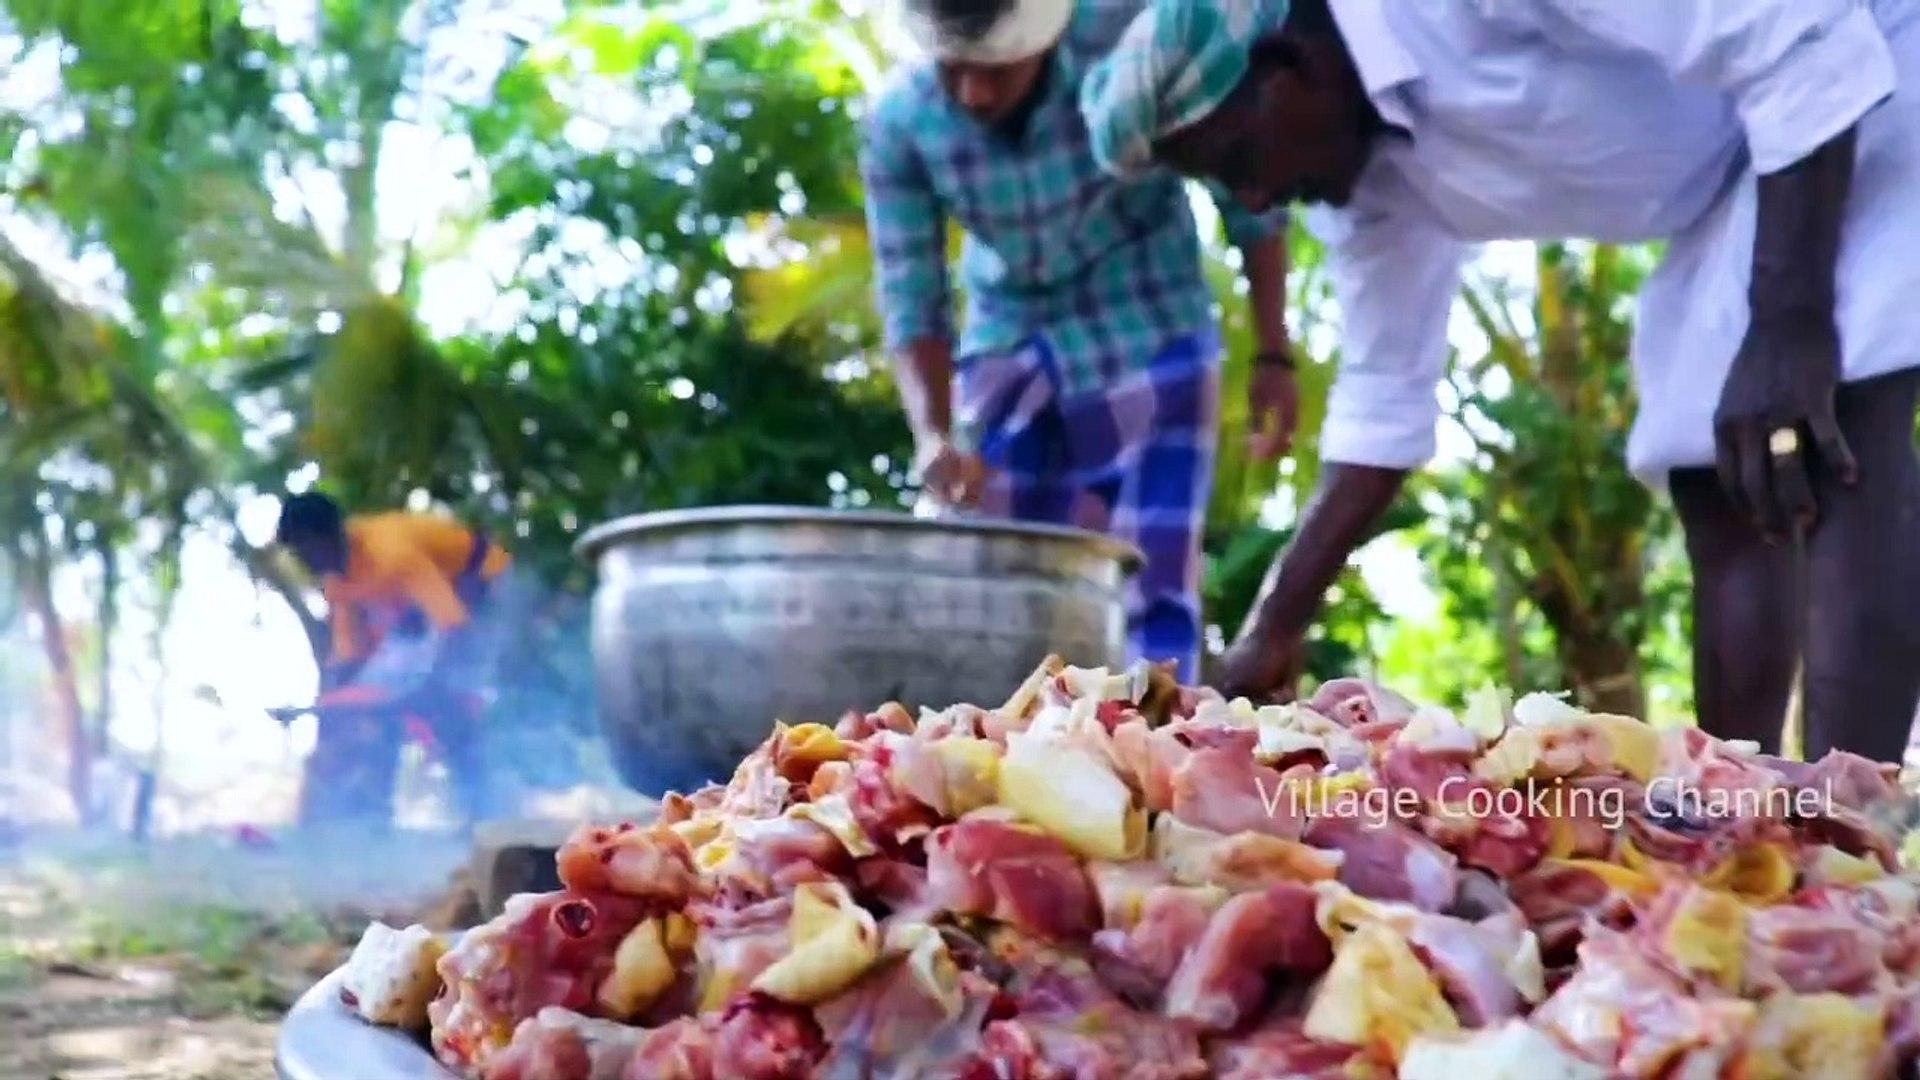 Country Chicken Gravy - Nattu Kozhi Kulambu - Cooking Traditional Village Country Chicken Recipe - C